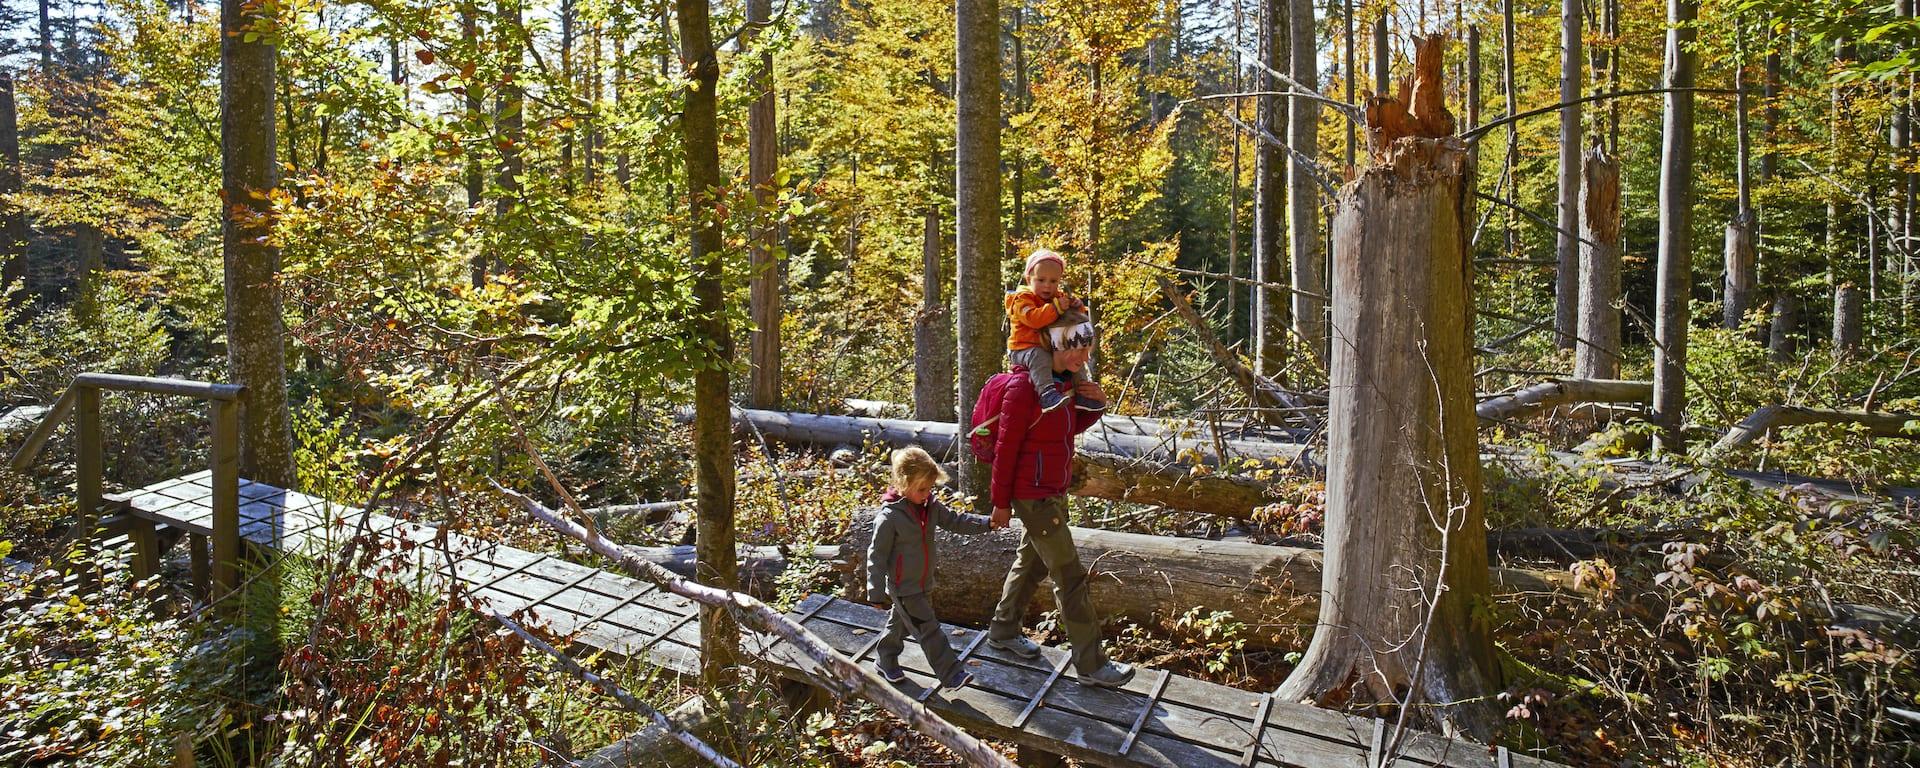 nationalpark bayerischer wald ausflugsziel wandern. Black Bedroom Furniture Sets. Home Design Ideas